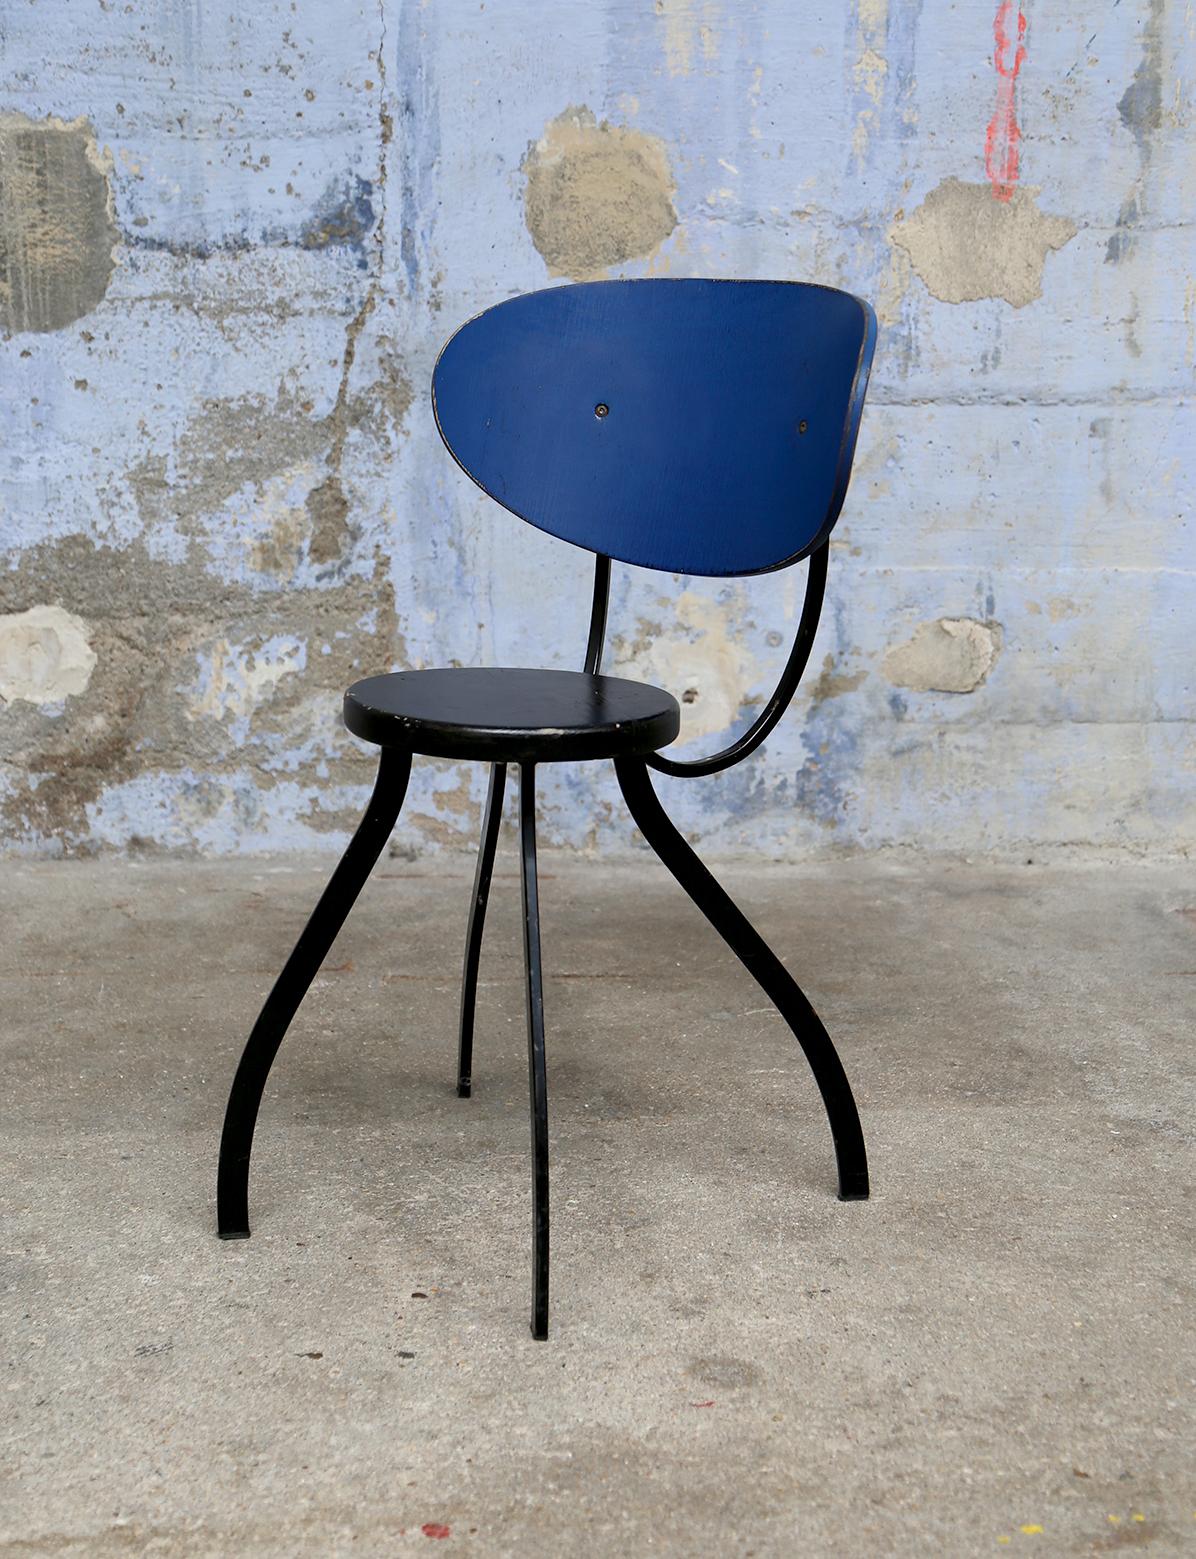 Ancienne Chaise bleue